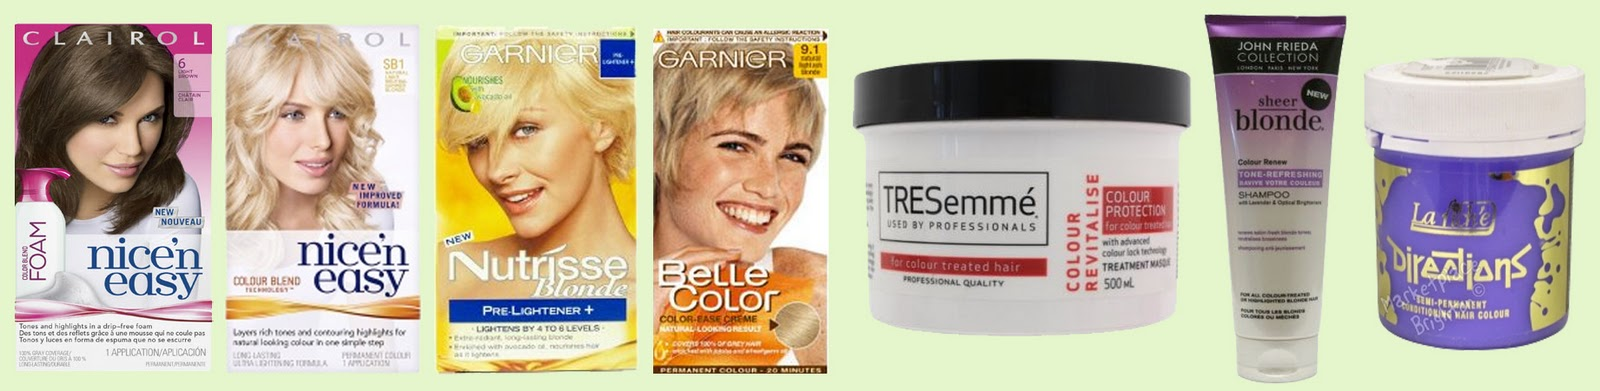 how to get rid of orange tones in my hair